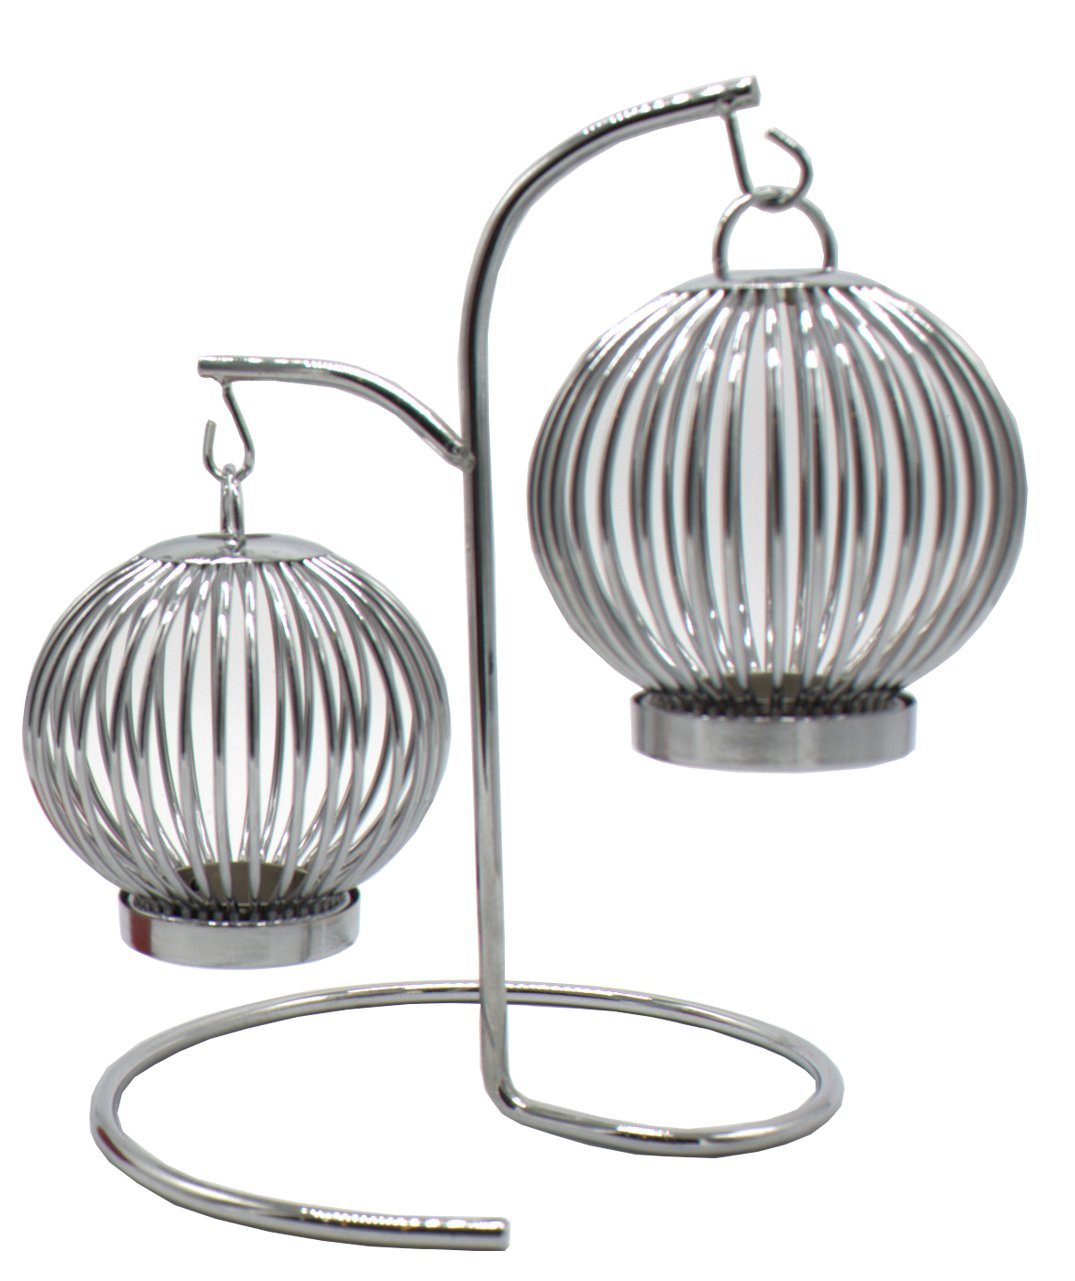 Baohao stainless steel double - head round lantern candlestick 7.88''x10.44''